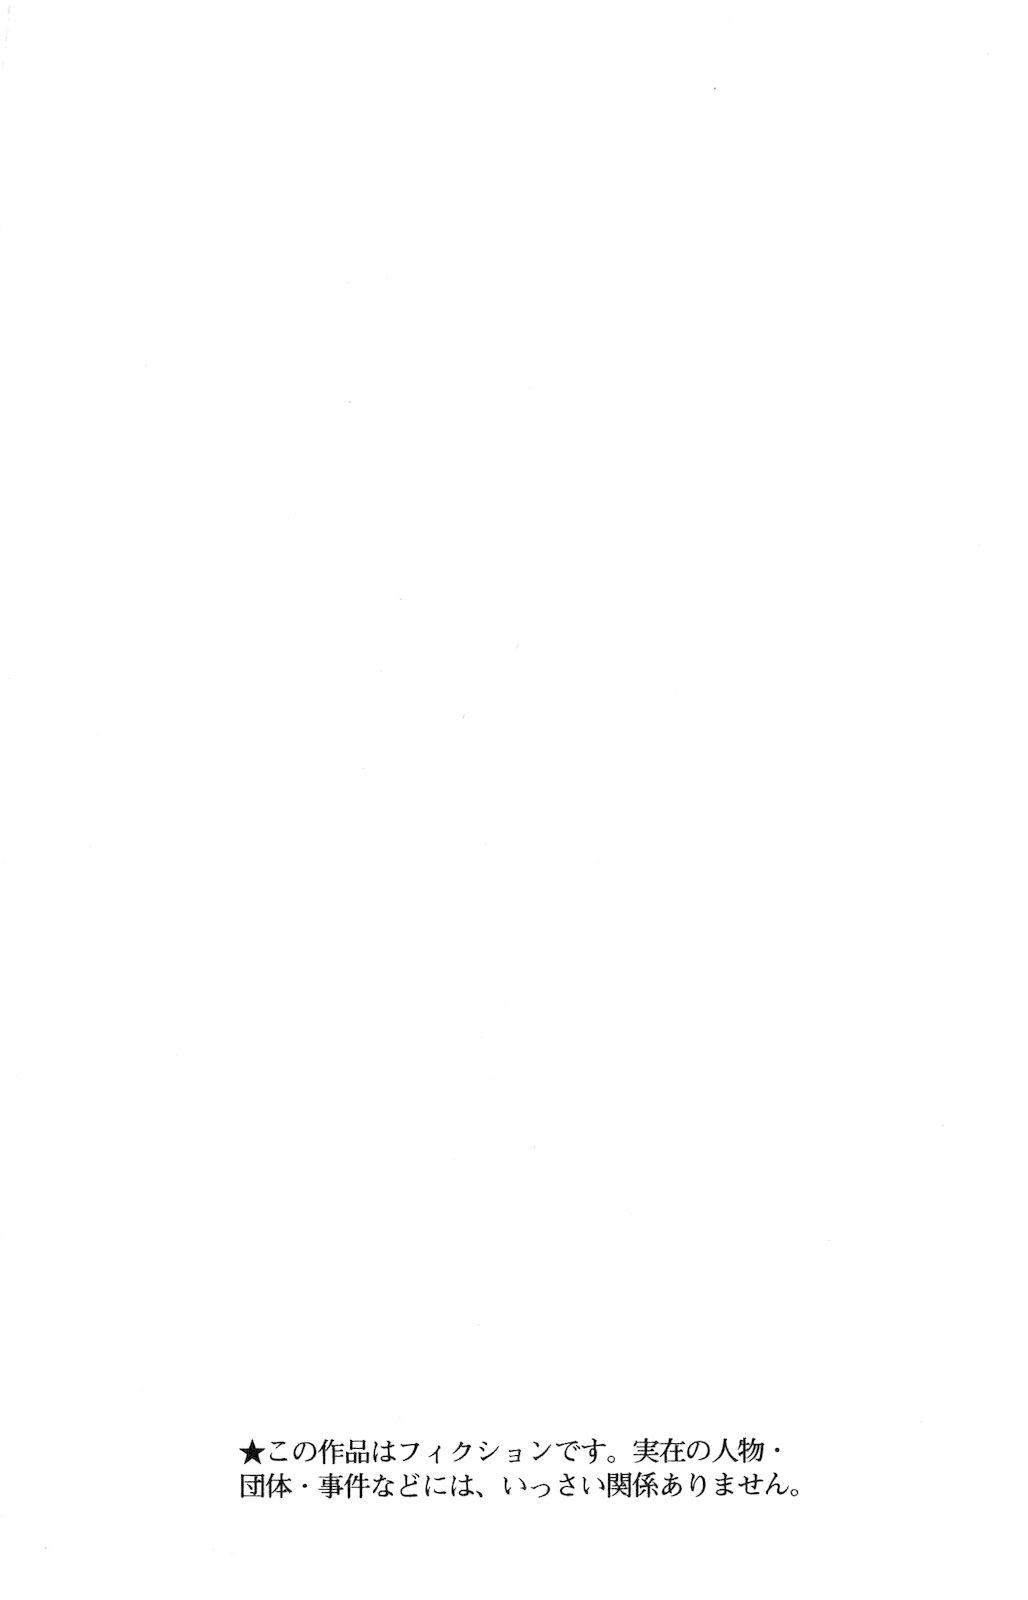 Манга Любовные неприятности / To Love-Ru  - Том 17 Глава 143 Страница 6